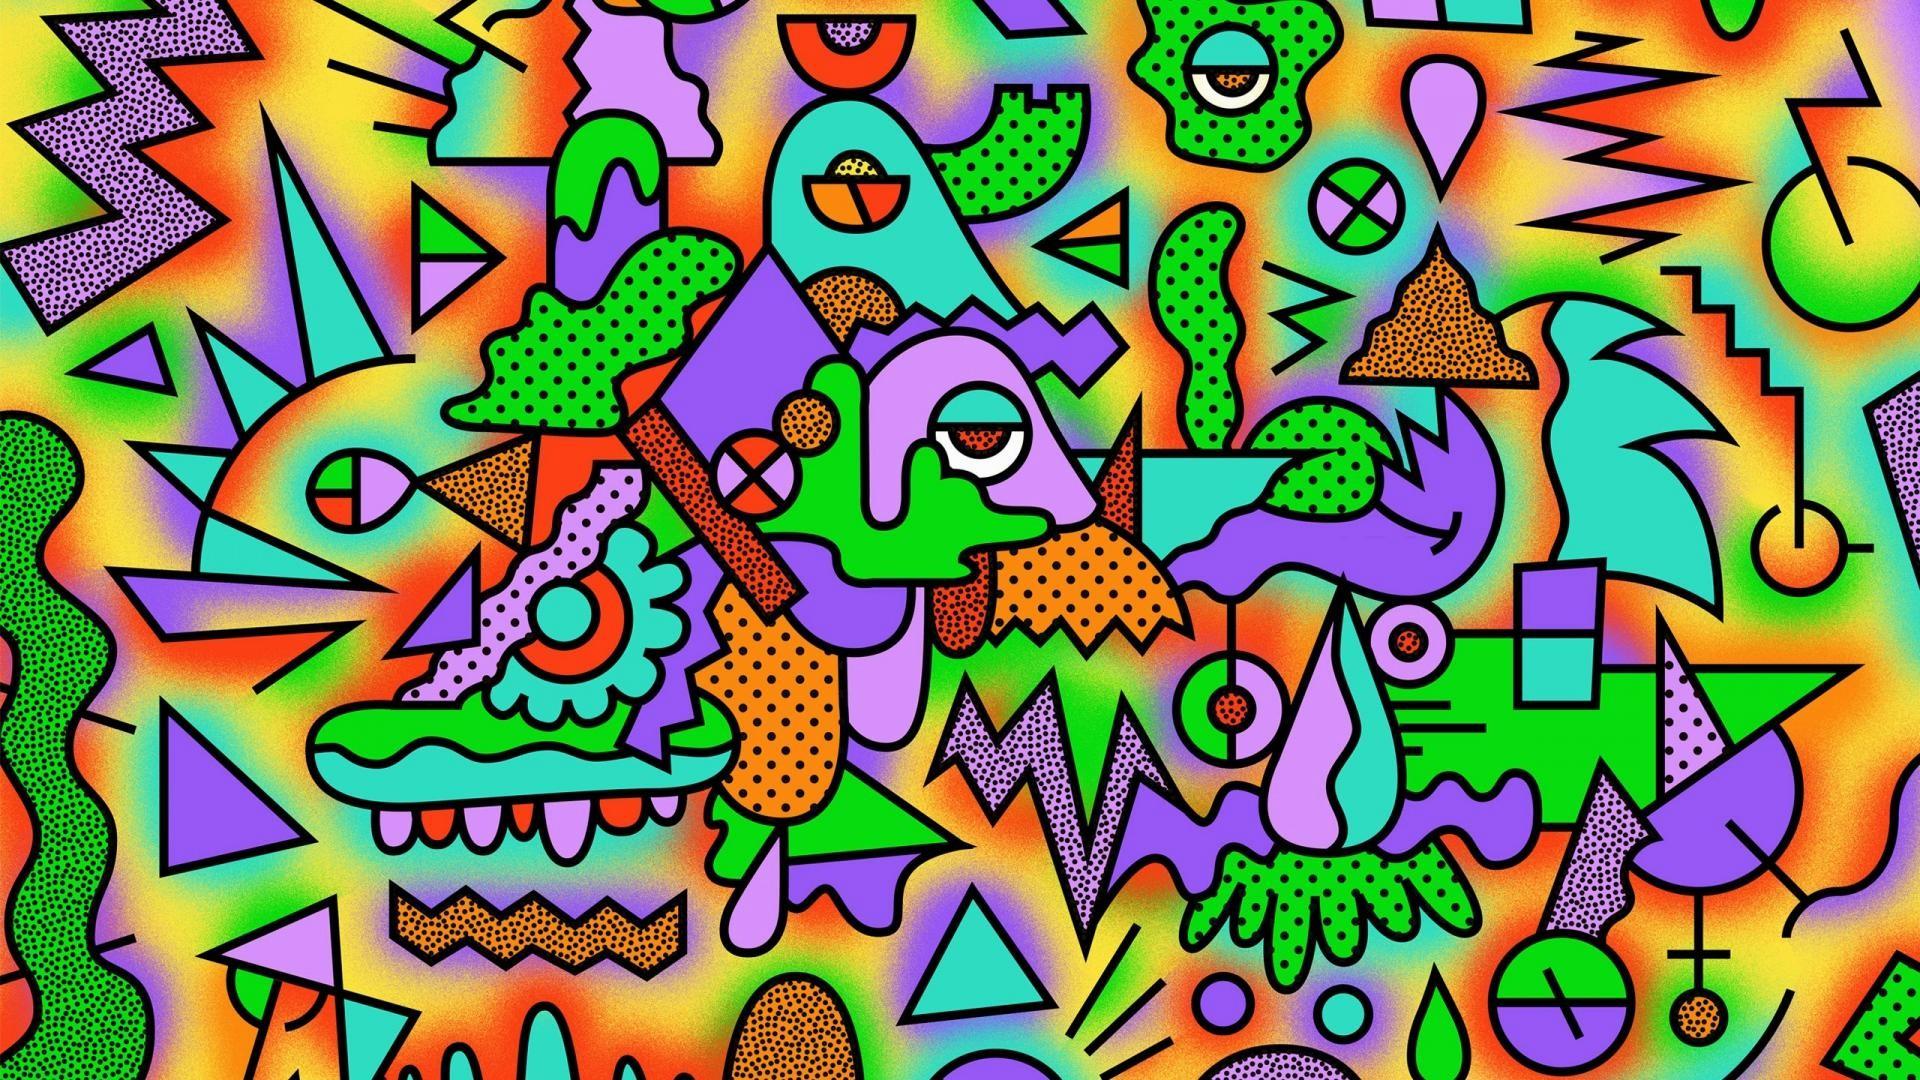 wallpaper.wiki-Figurines-Colorful-Drawing-Acid-Trip-Wallpaper-